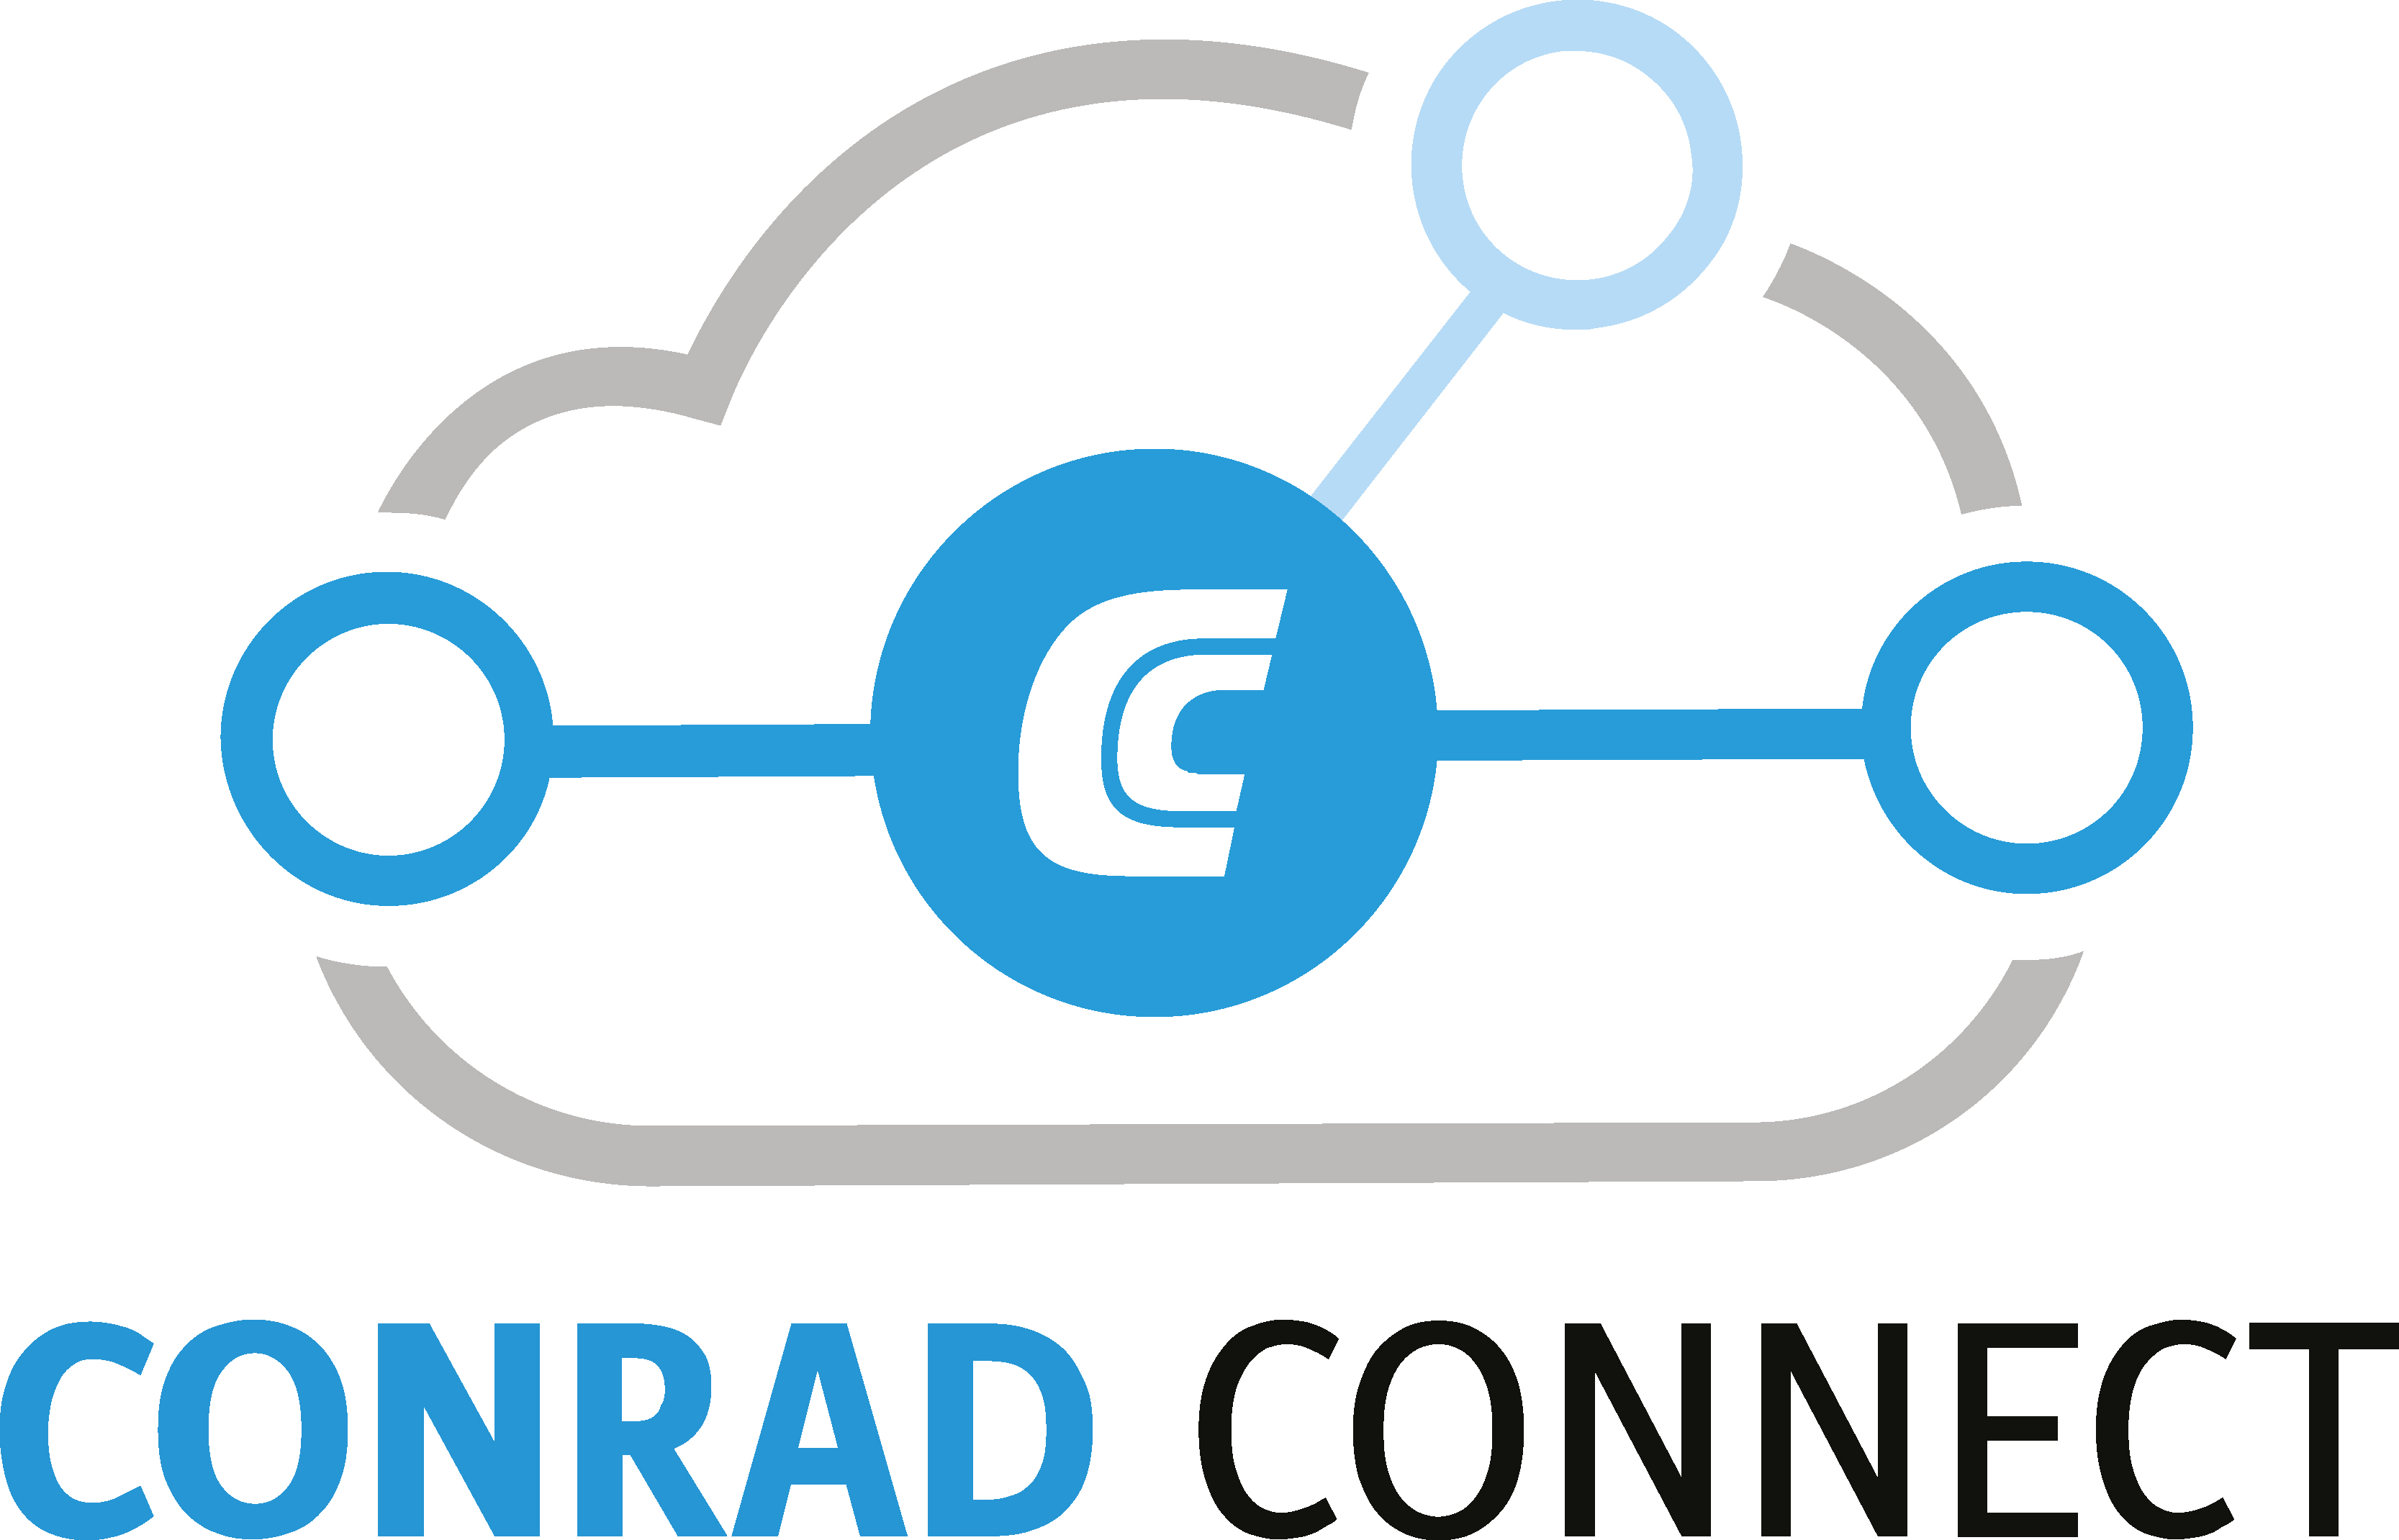 conrad connect ist sponsor des homematic user treffens eq 3. Black Bedroom Furniture Sets. Home Design Ideas